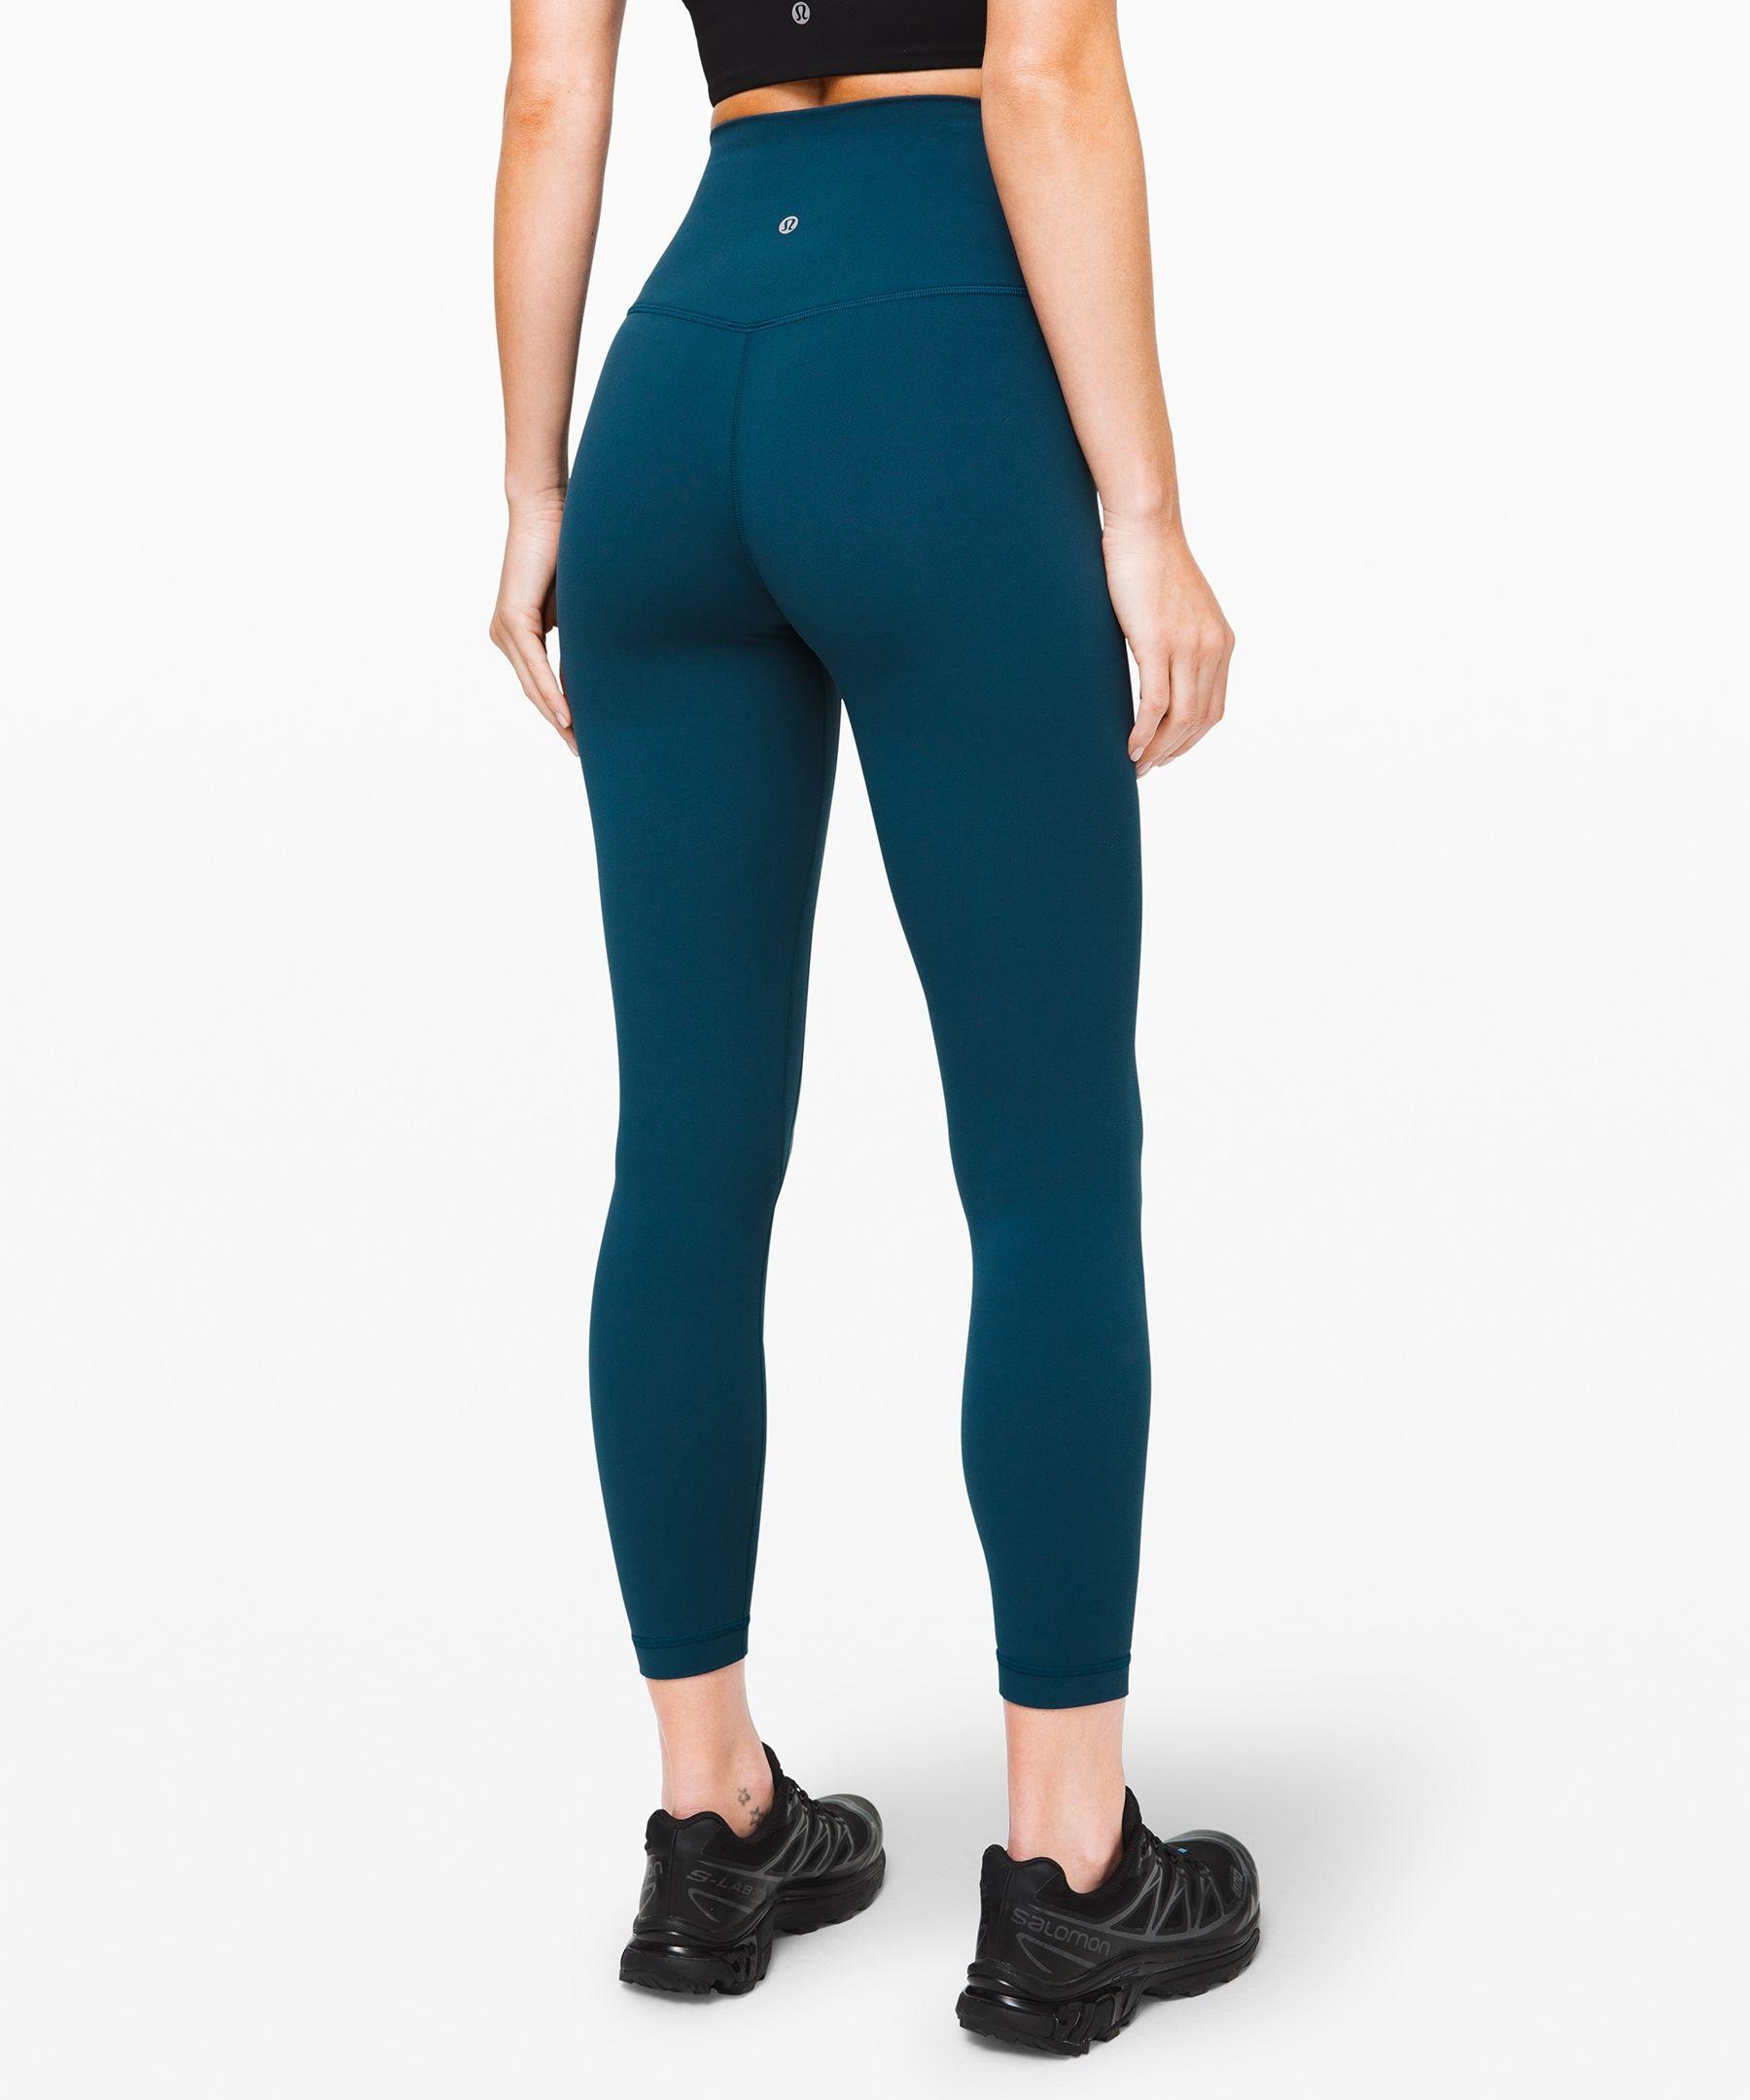 "lululemon Women's Align Pant 31"", Night Diver, Size 0 in"